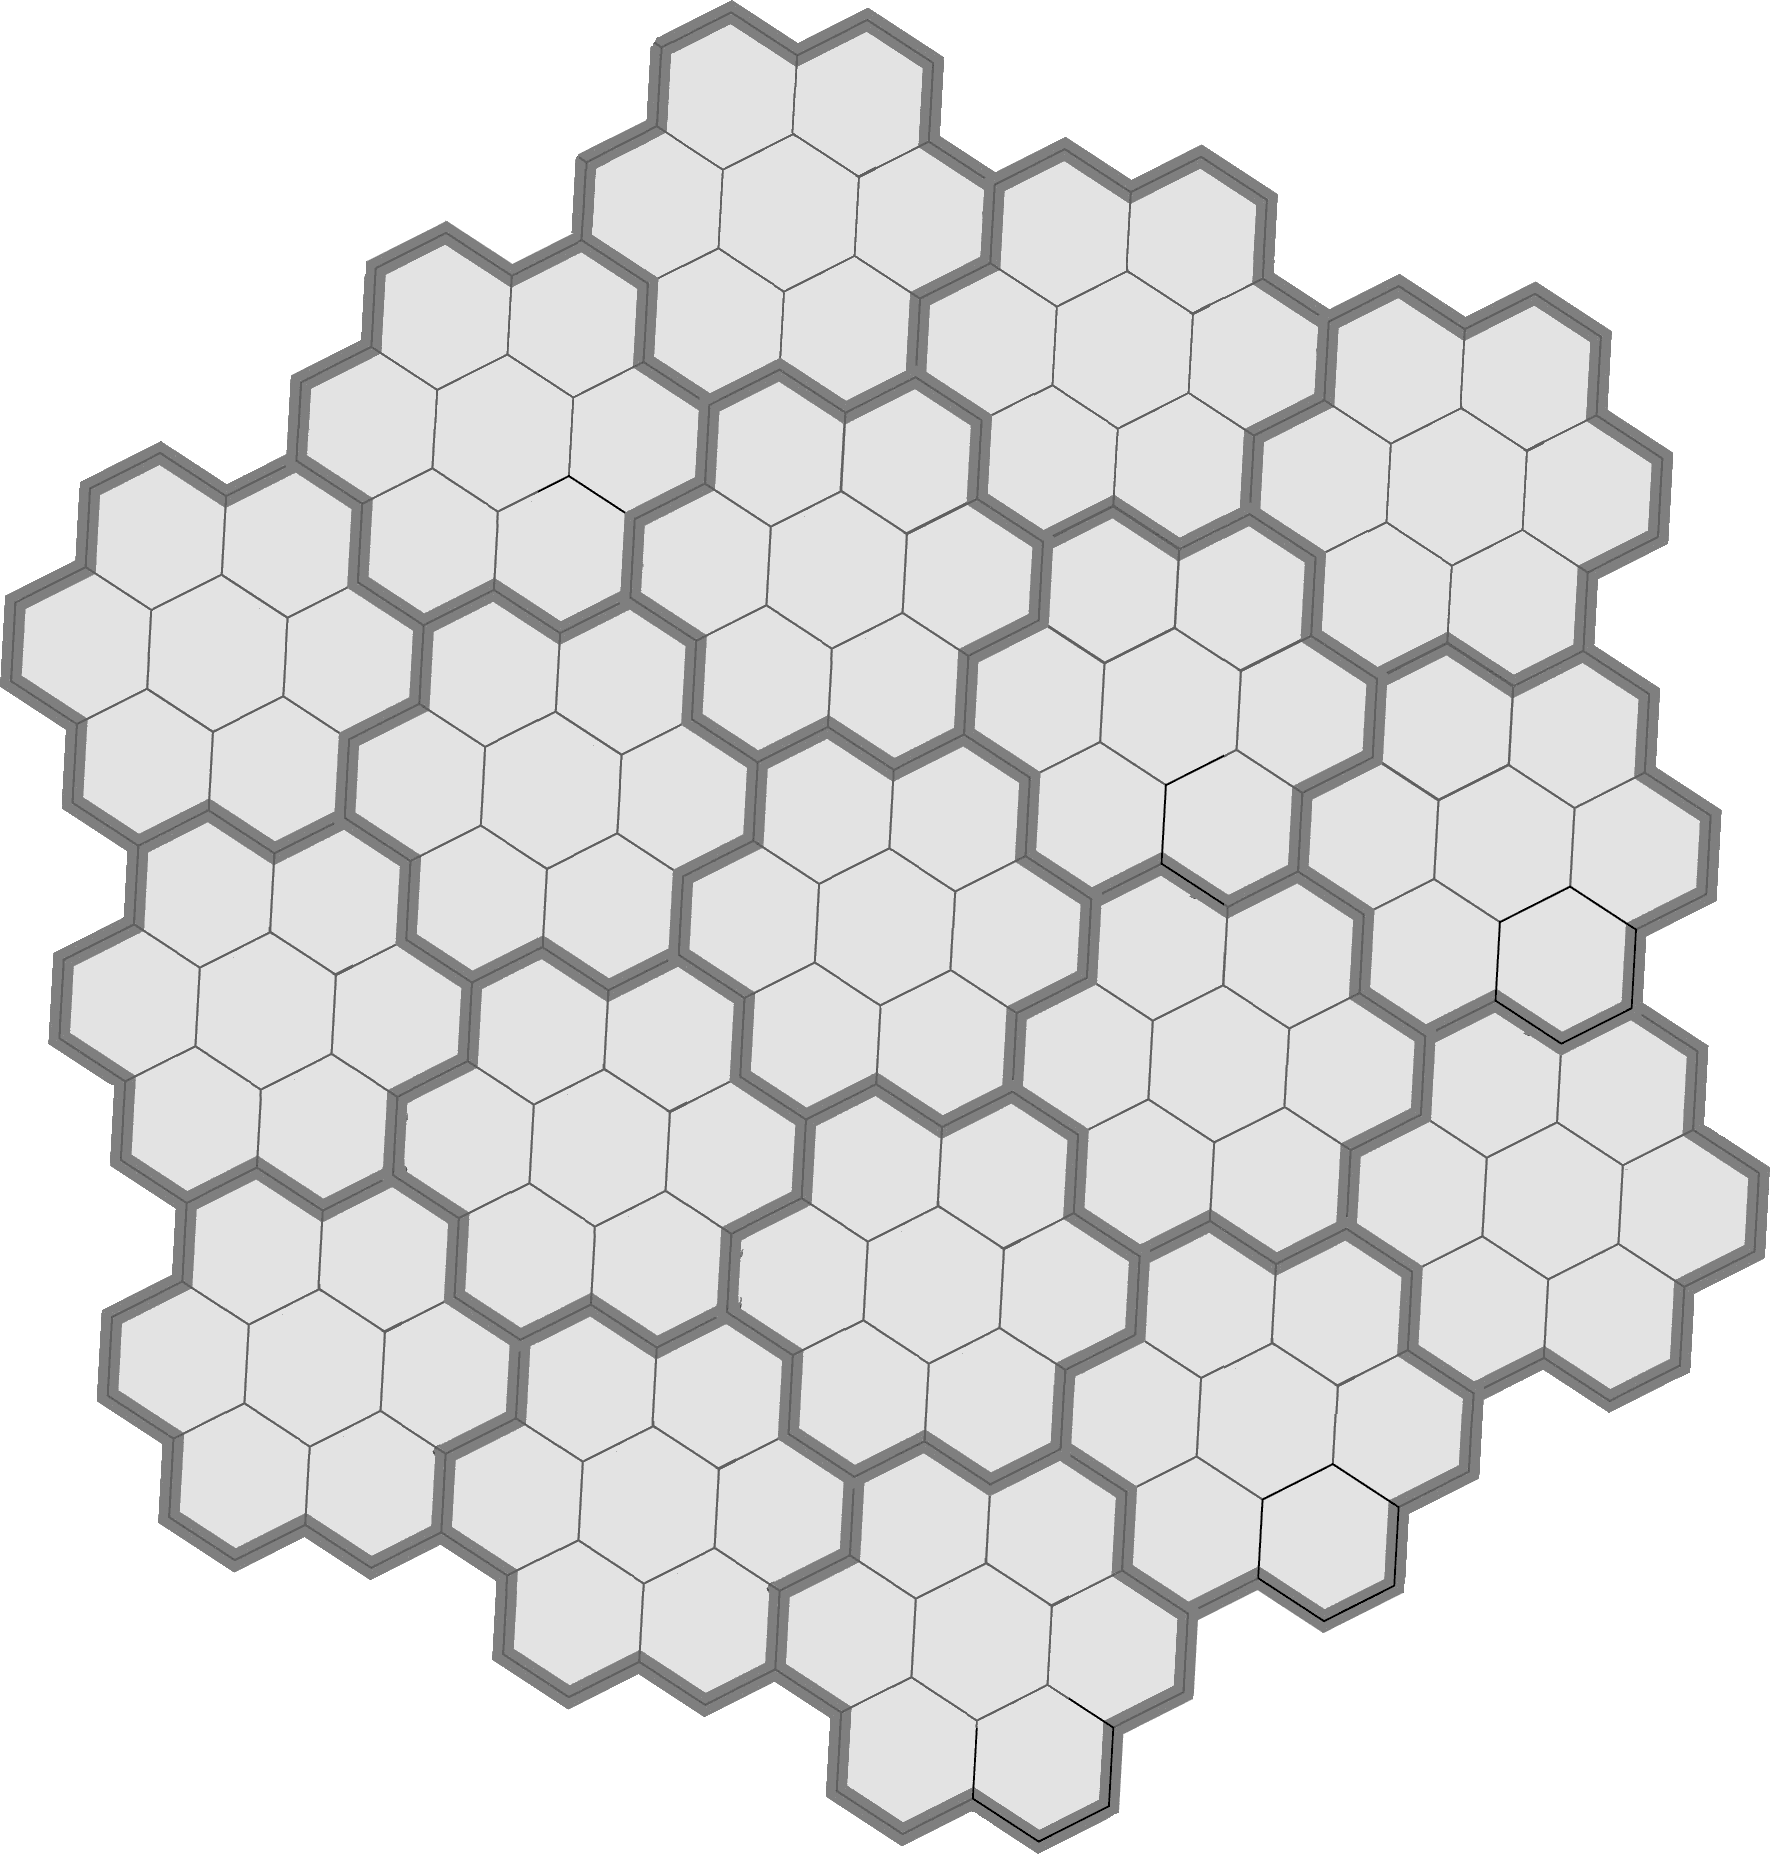 Ug Chambergmh Hexagon Game Hexagon Fantasy Board Games